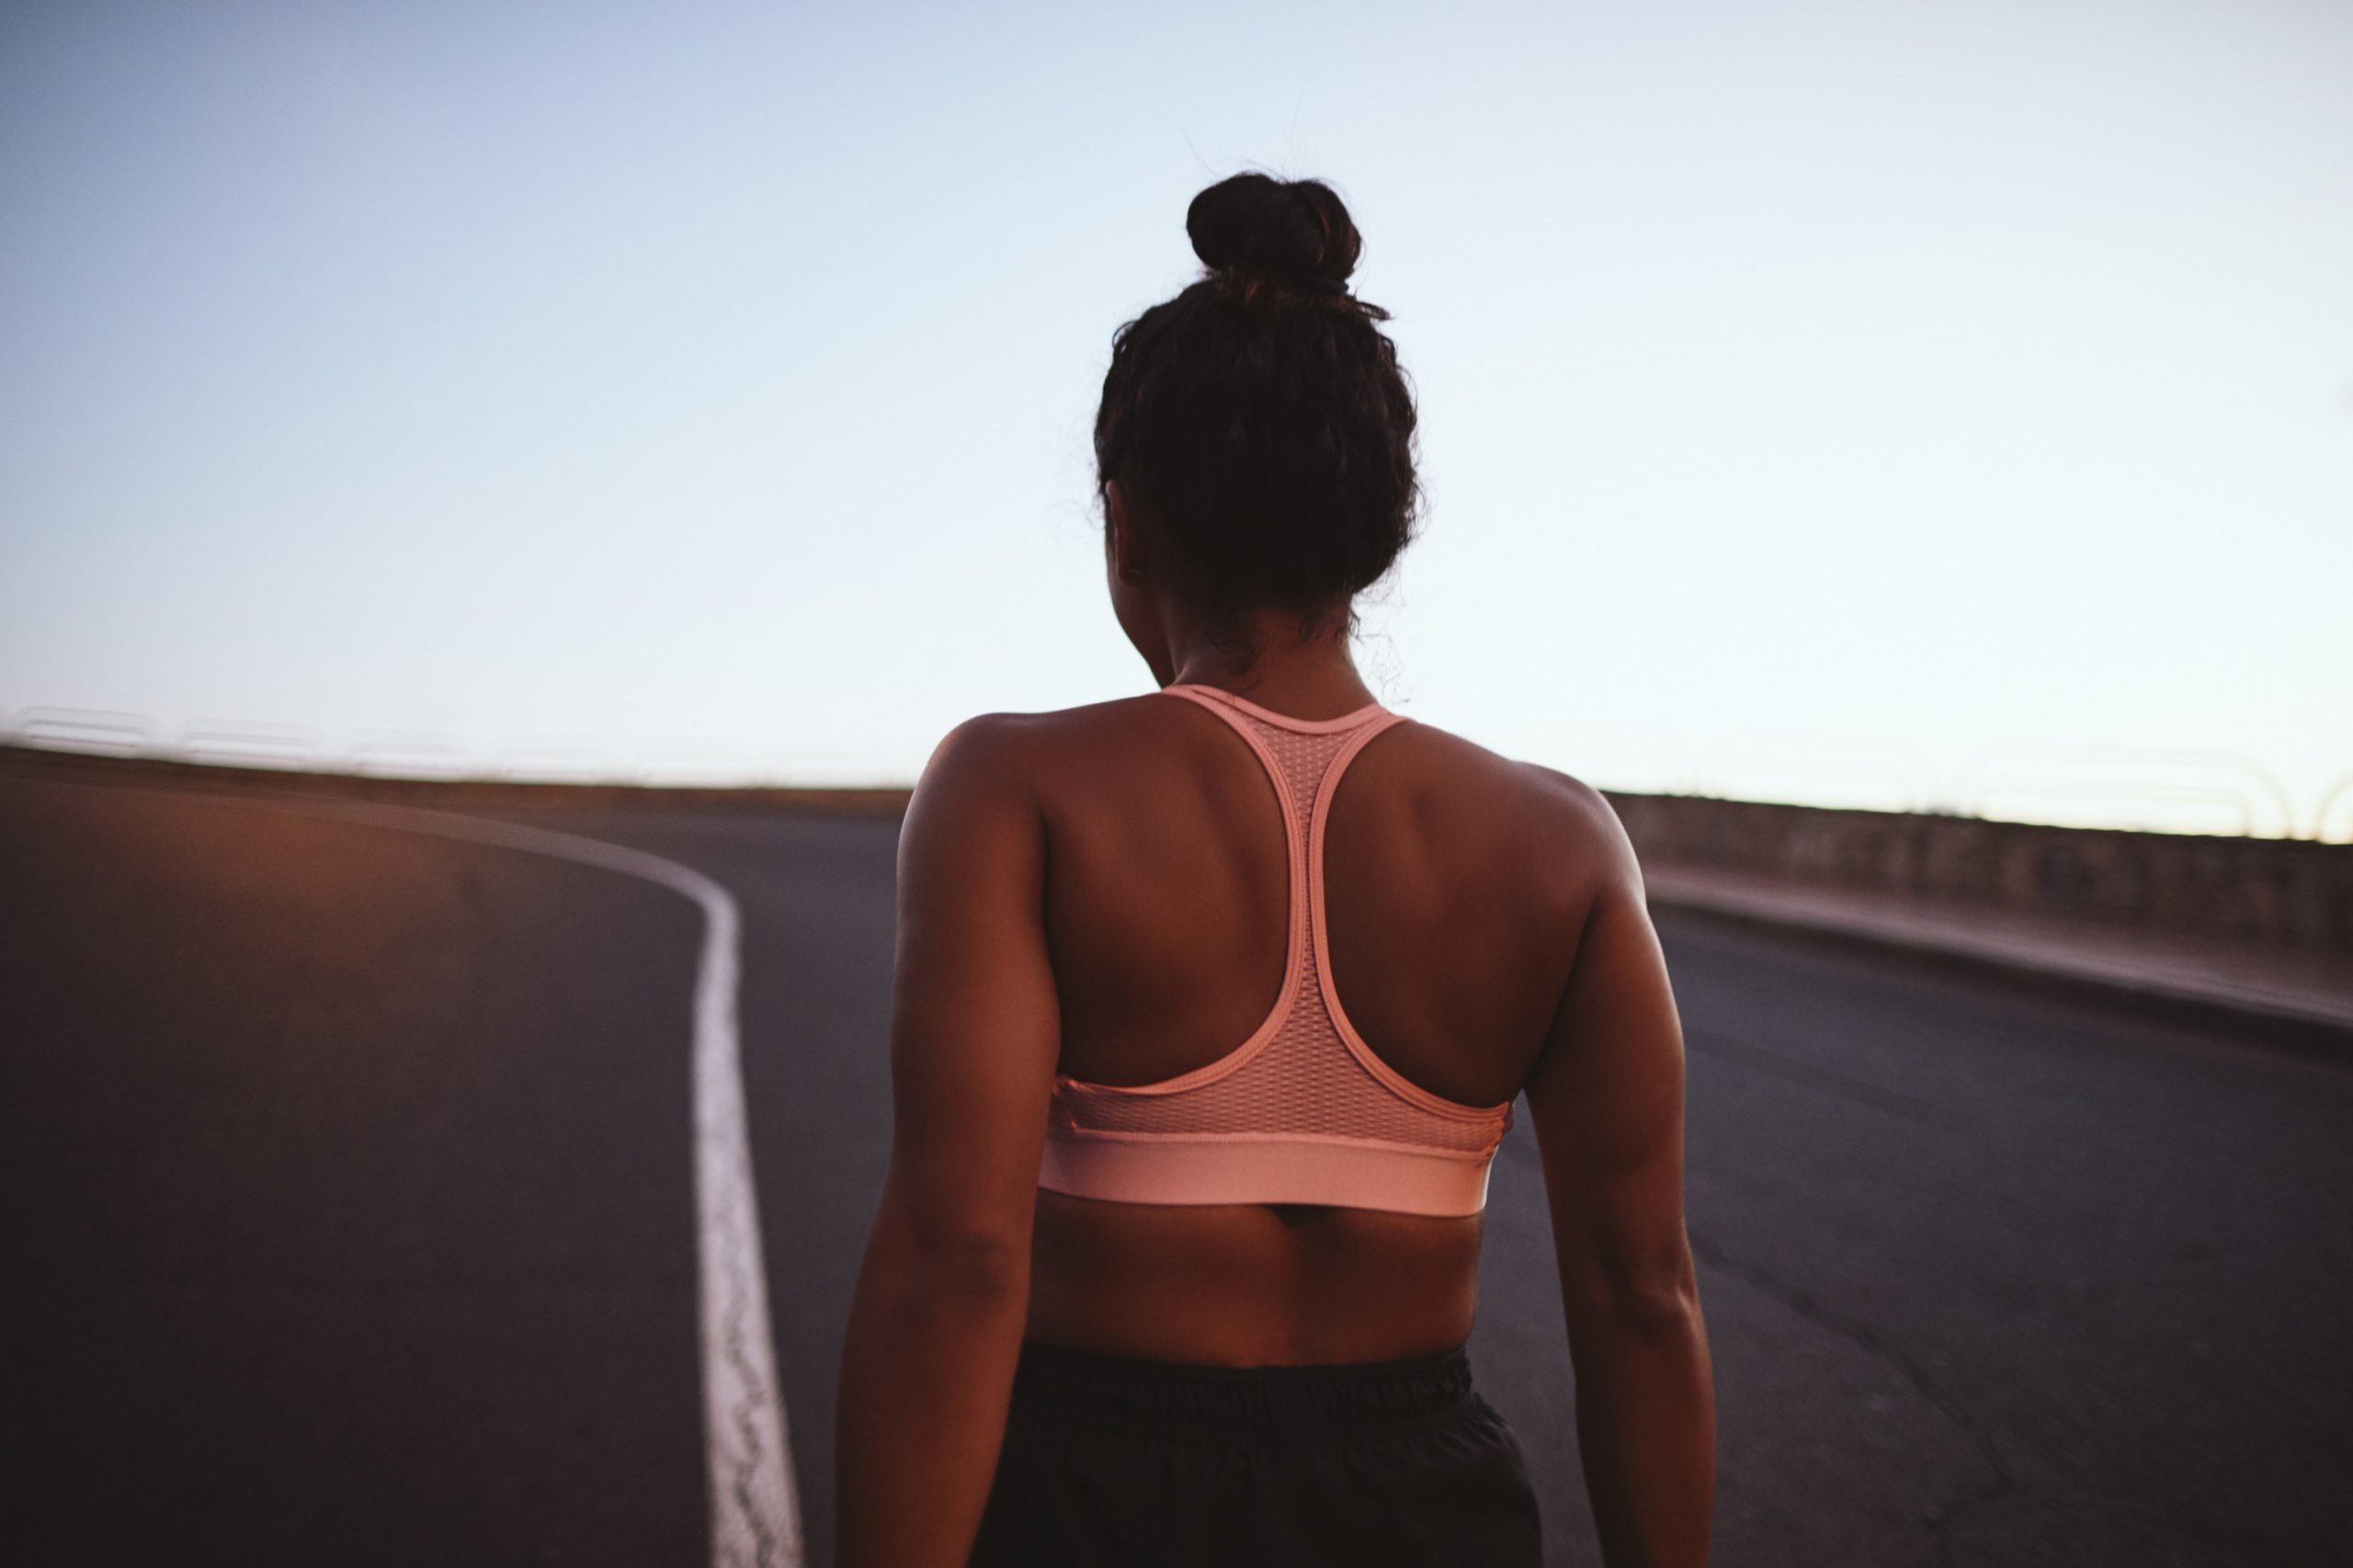 Person at track jogging